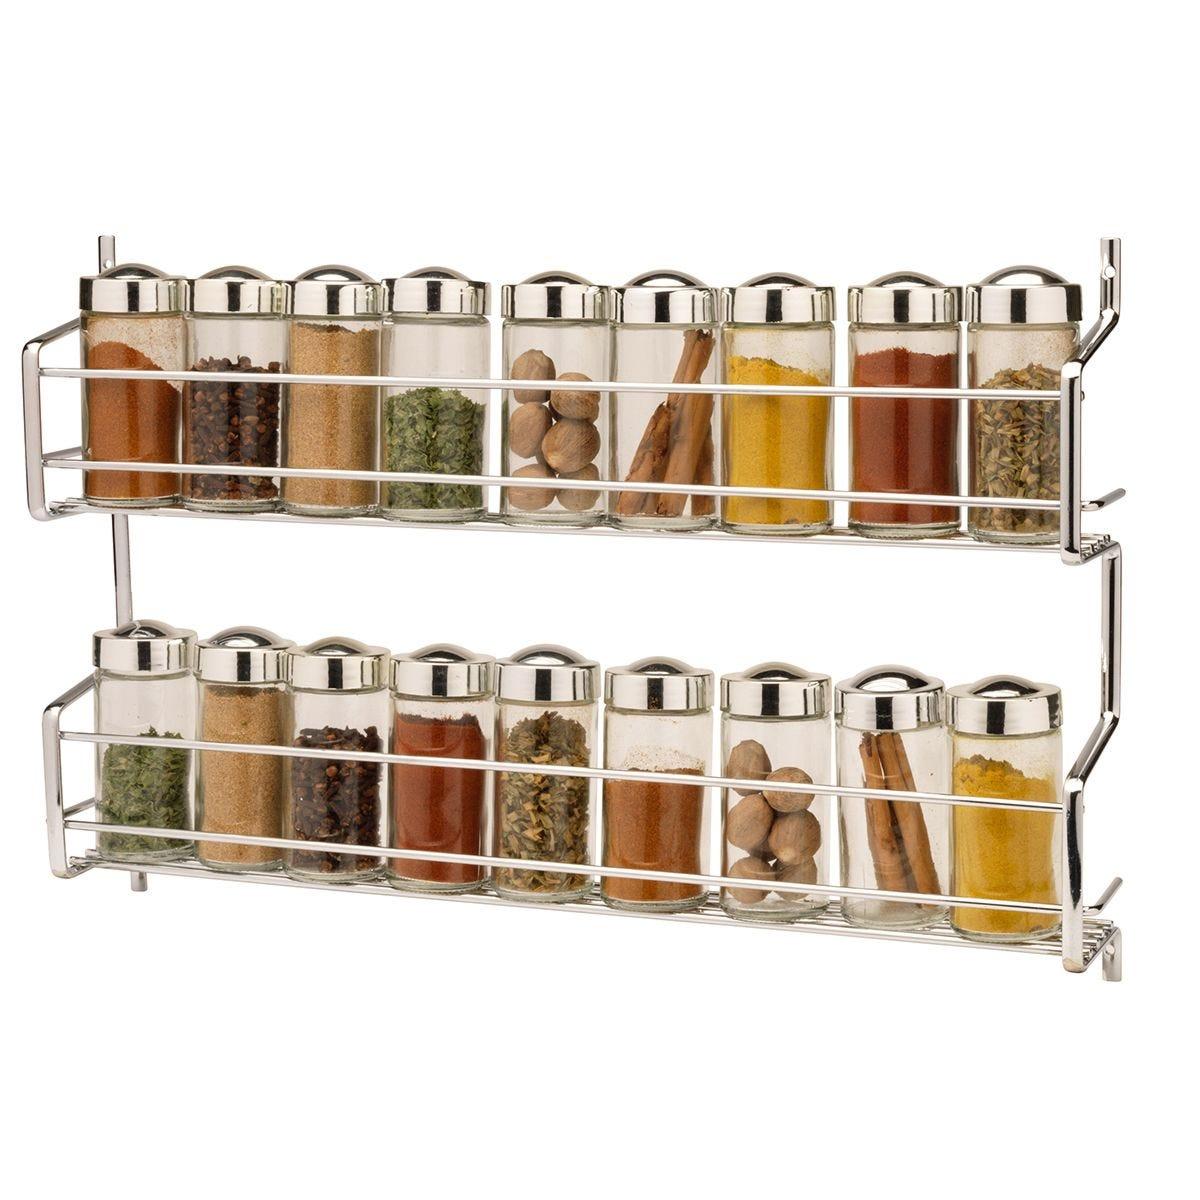 Hahn Metro Premium 2 Tier Wall/Cupboard Spice Rack With 18 Jars